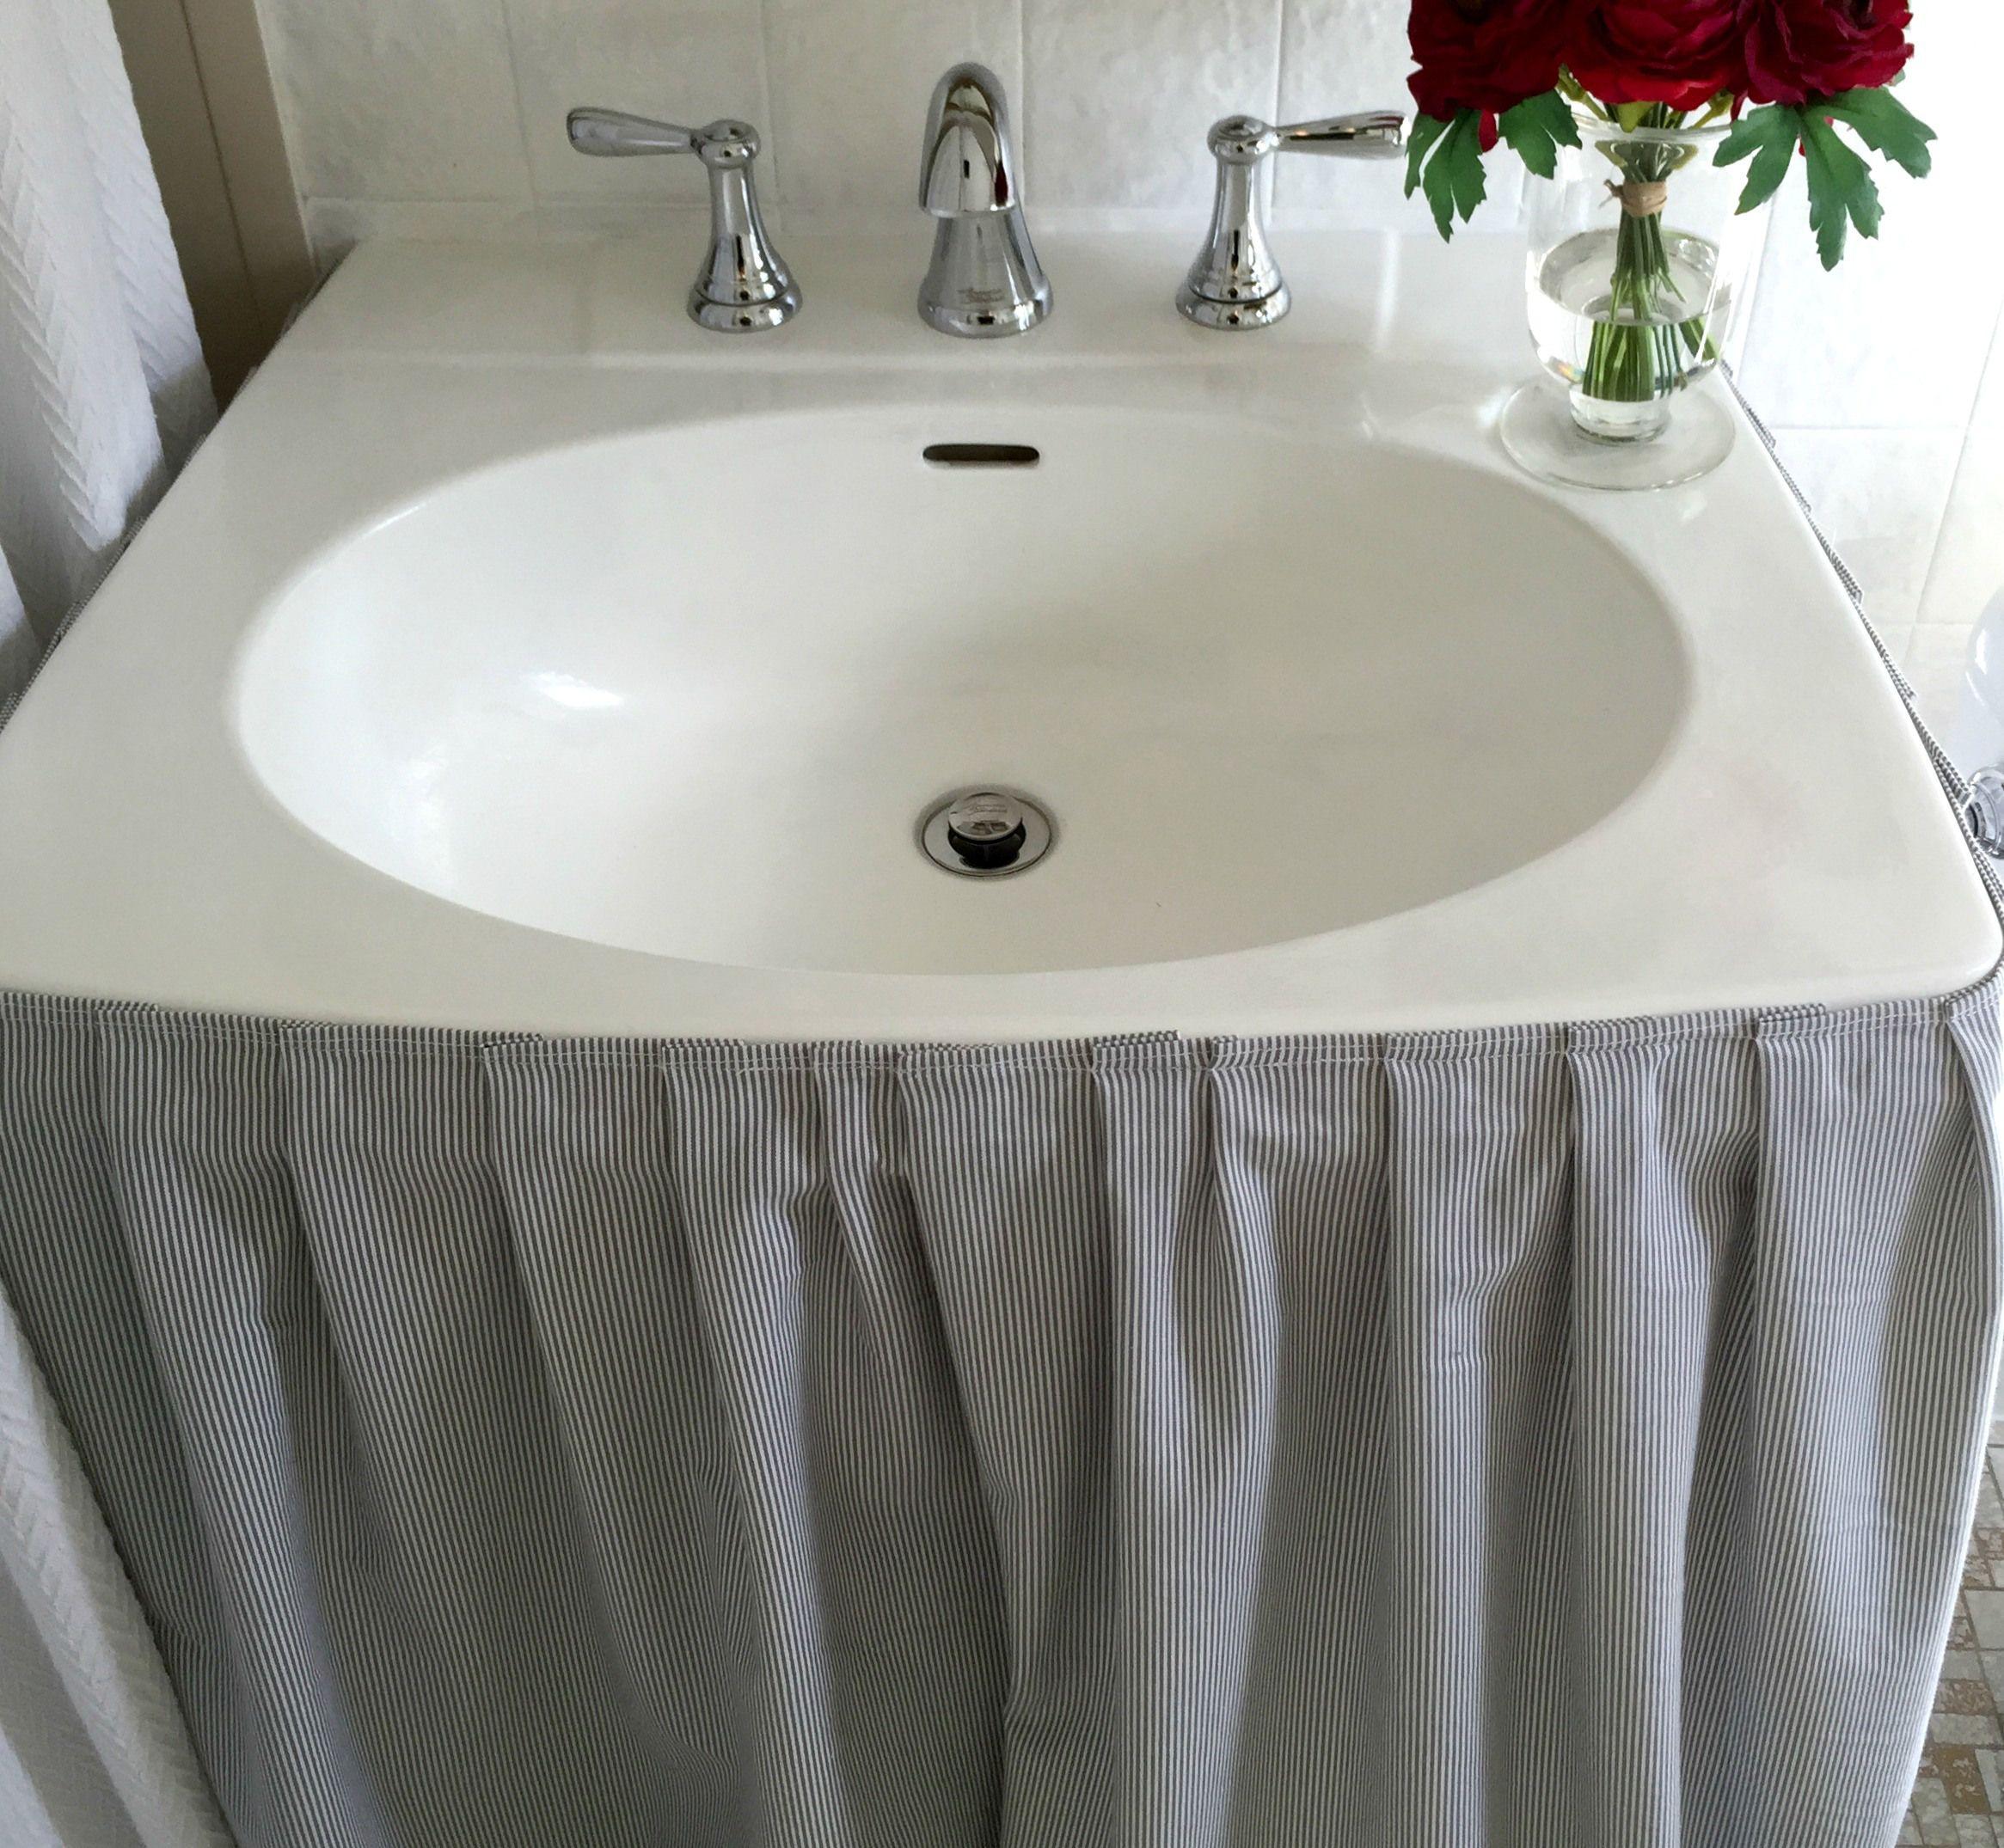 Pedestal Sink Skirt Tutorial